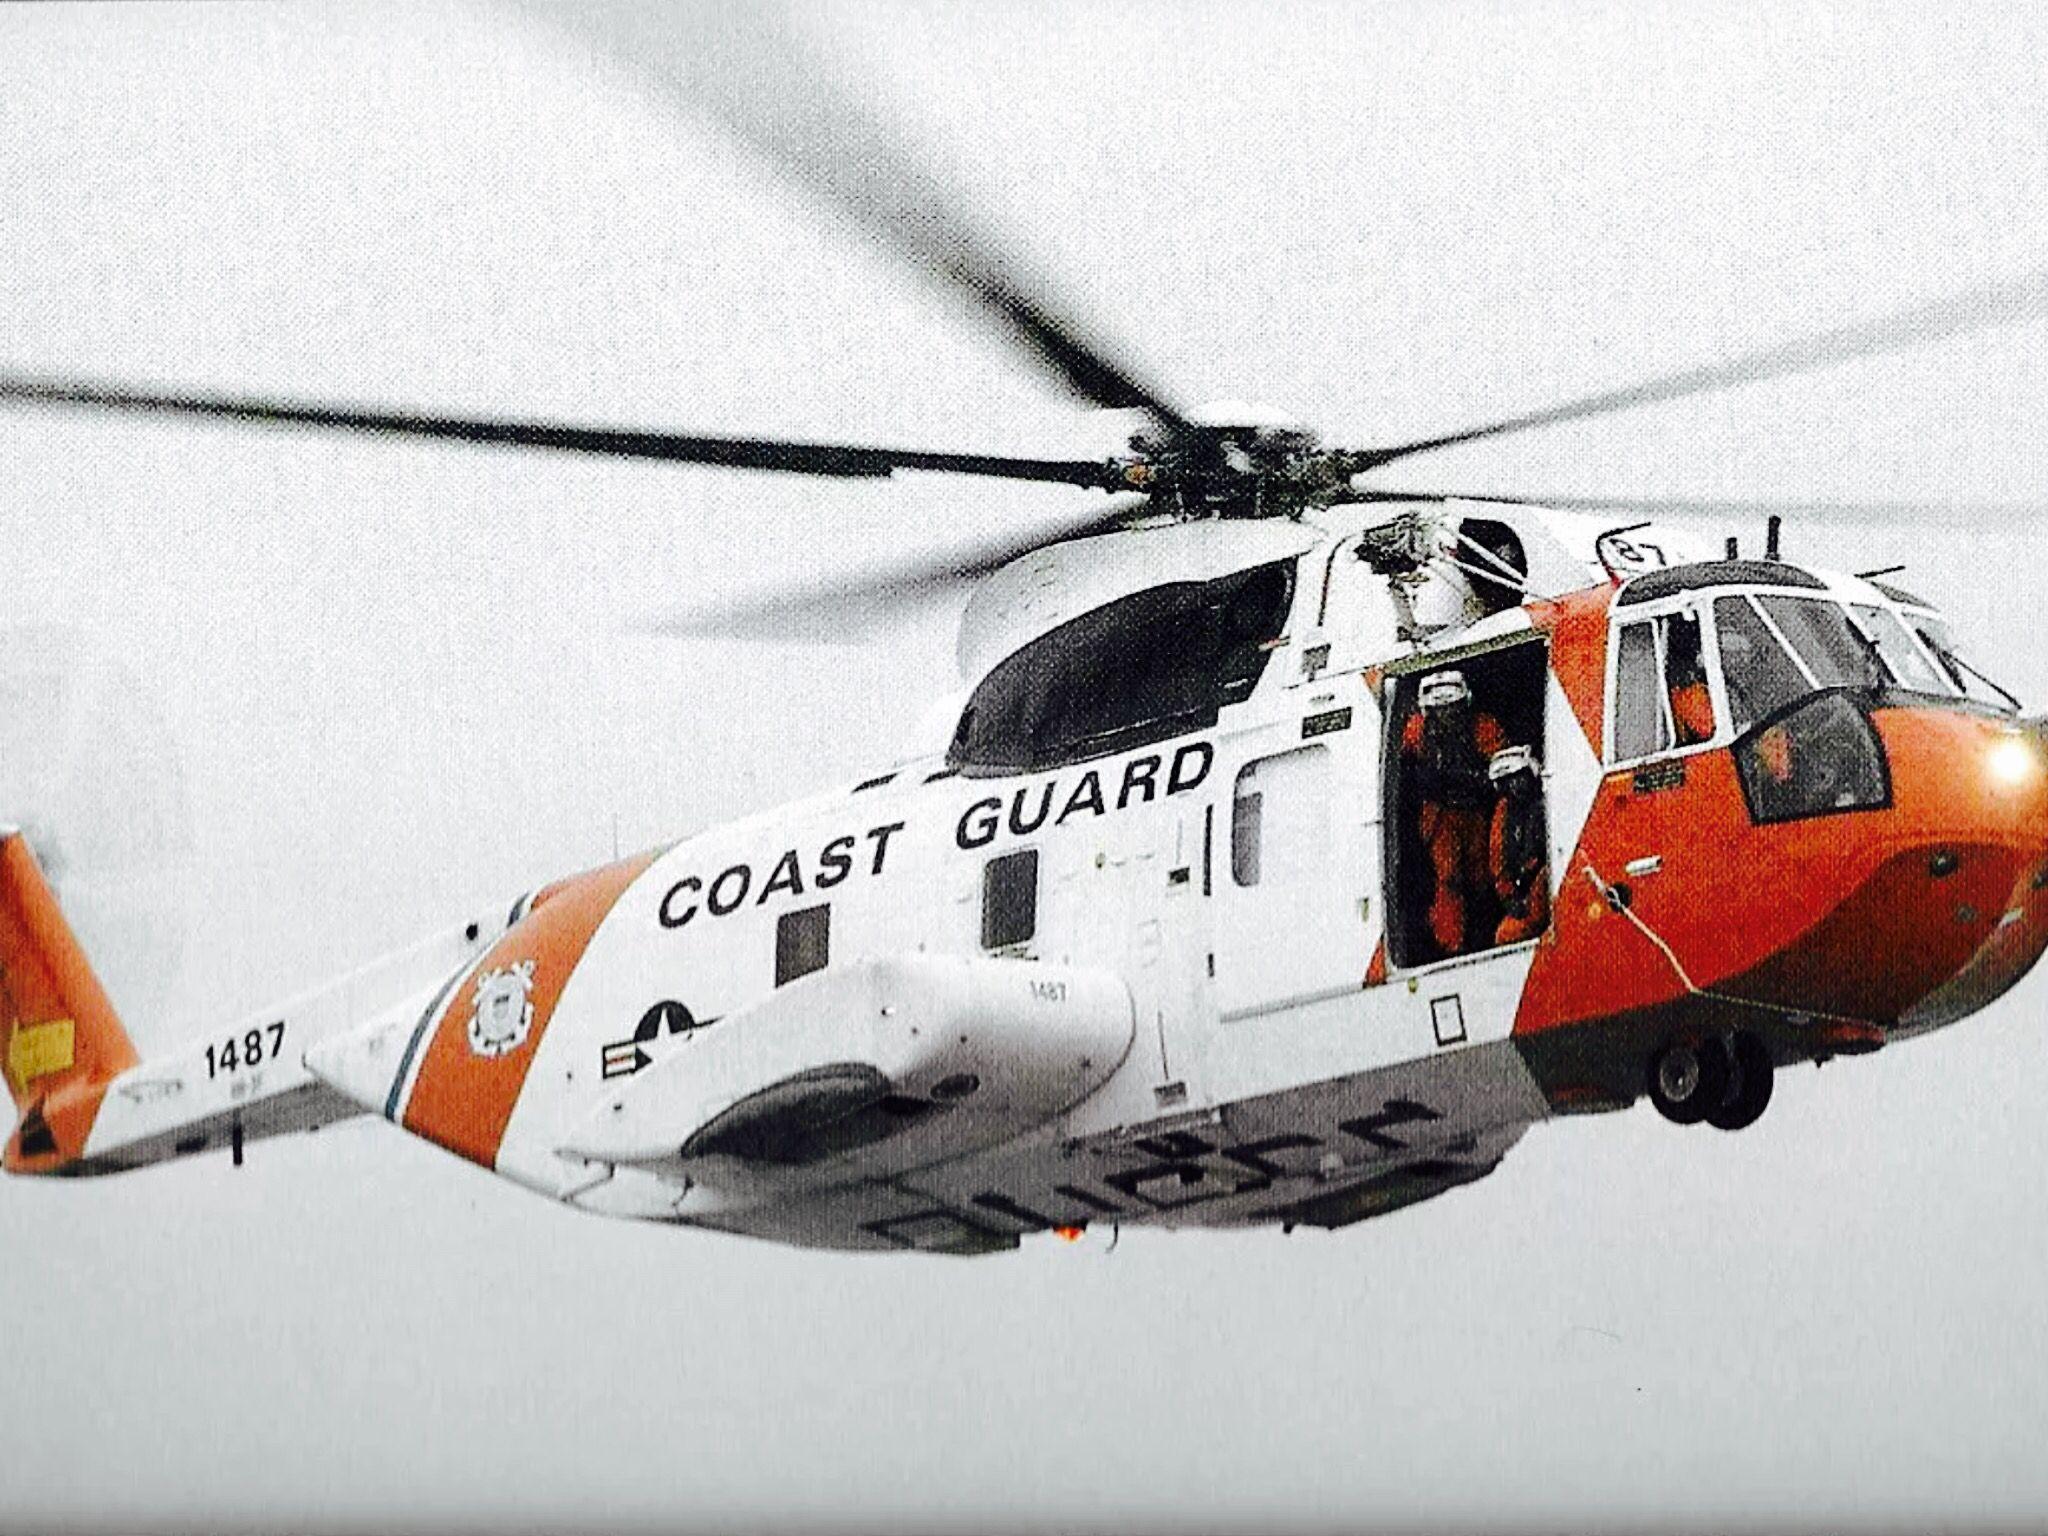 Pin on Coast Guard/Rescue Aircraft